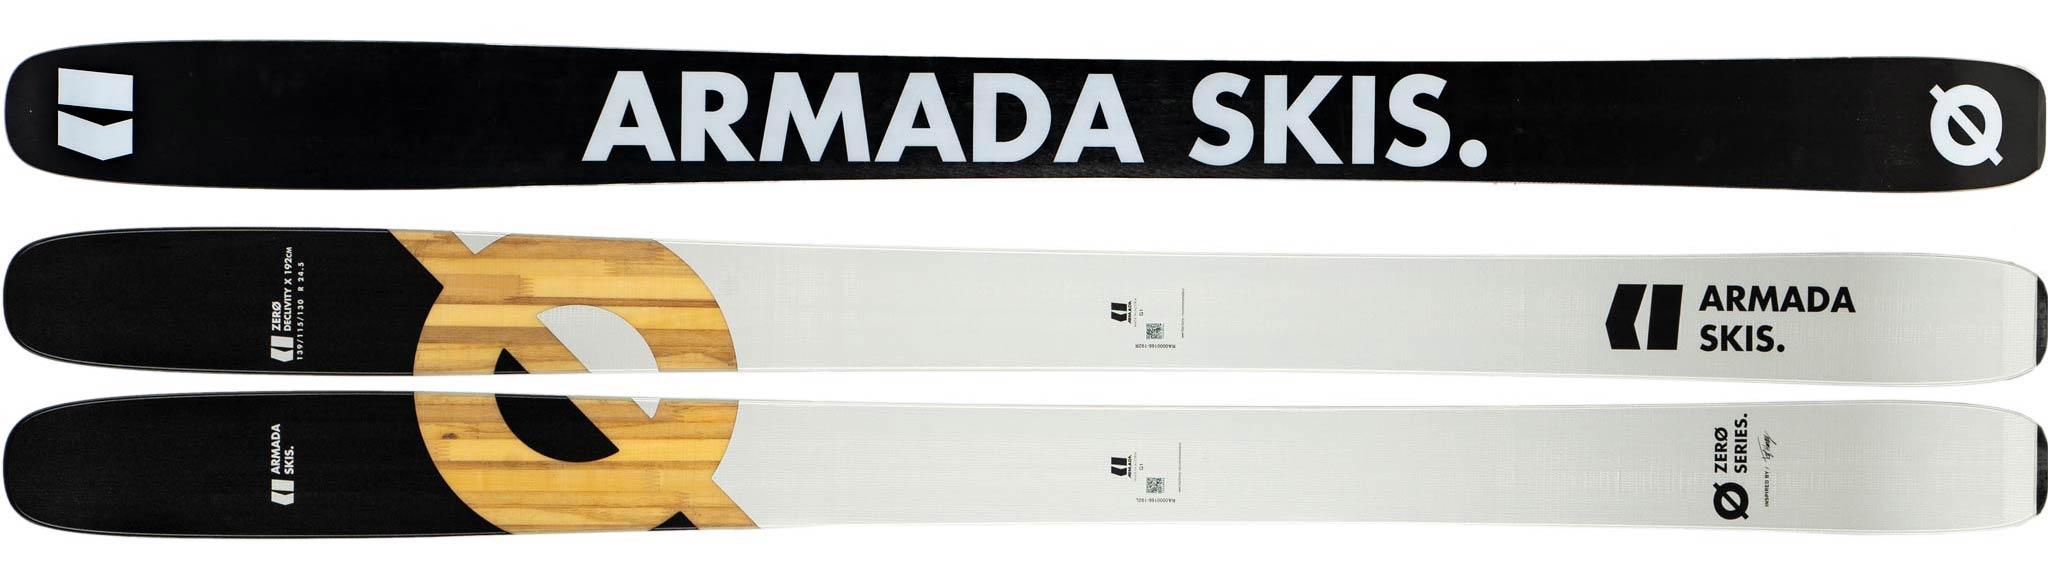 Armada Skis 2019/2020 - Zero Declivity X: Topsheet und Base